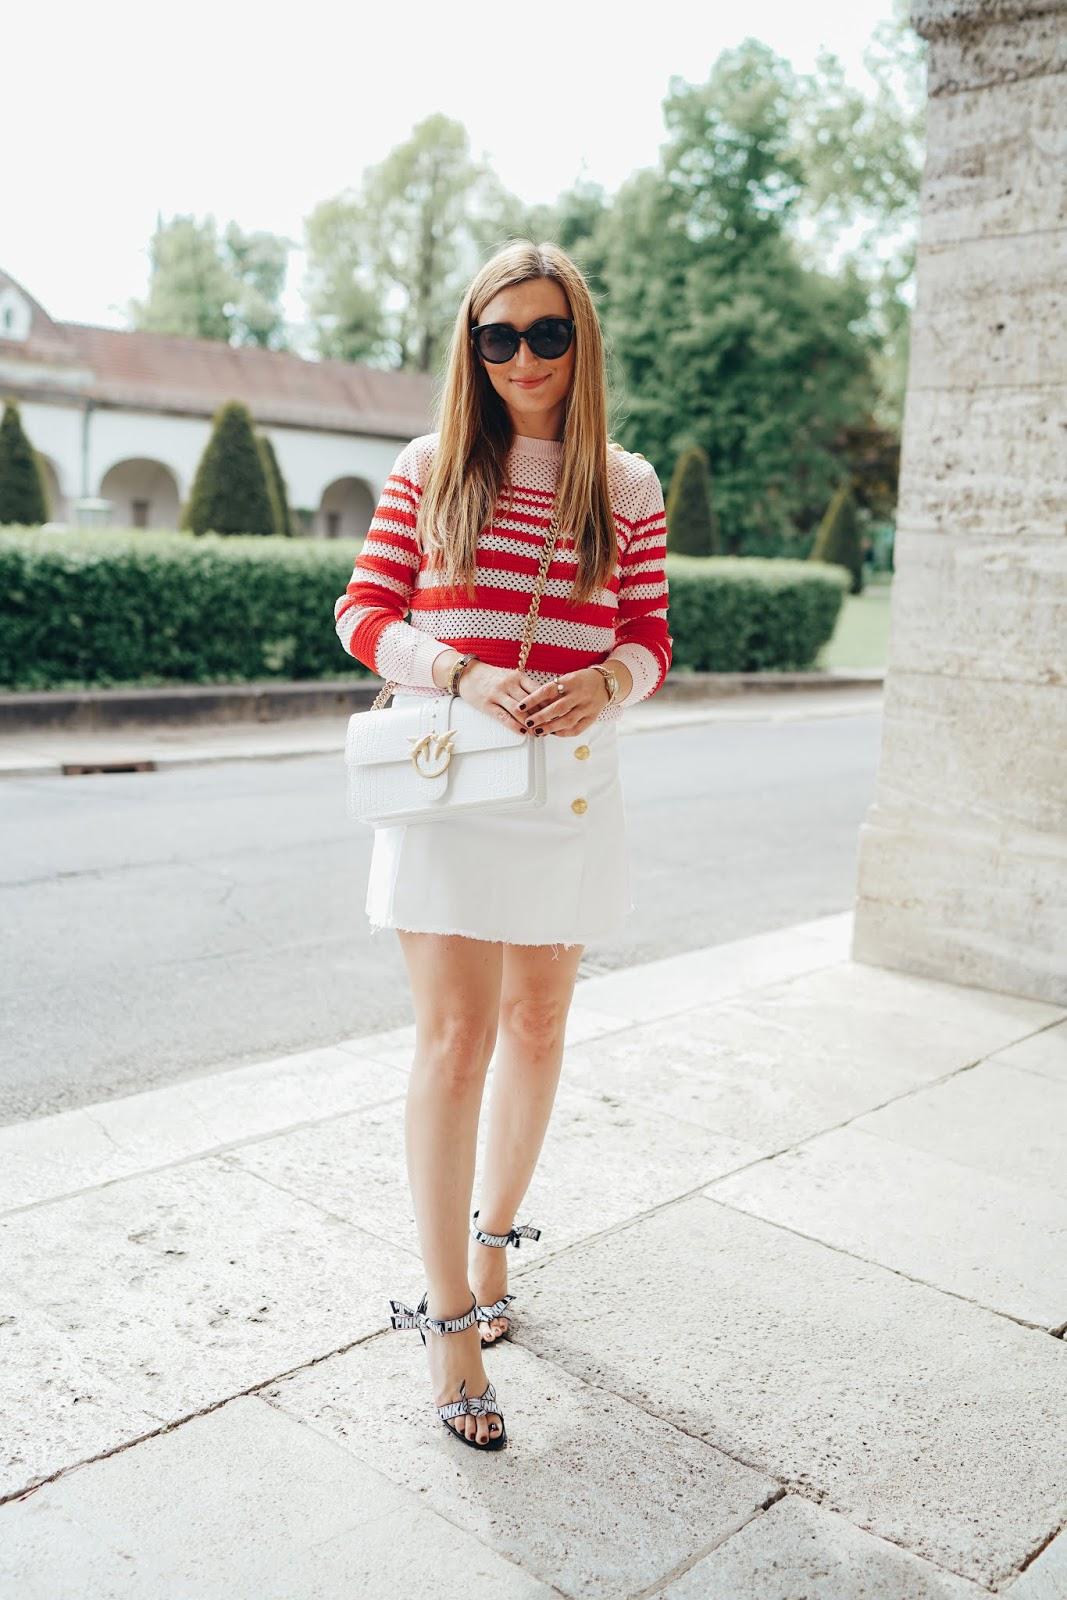 Sommerstyle-fashionstylebyjohanna-blogger-aus-frankfurt